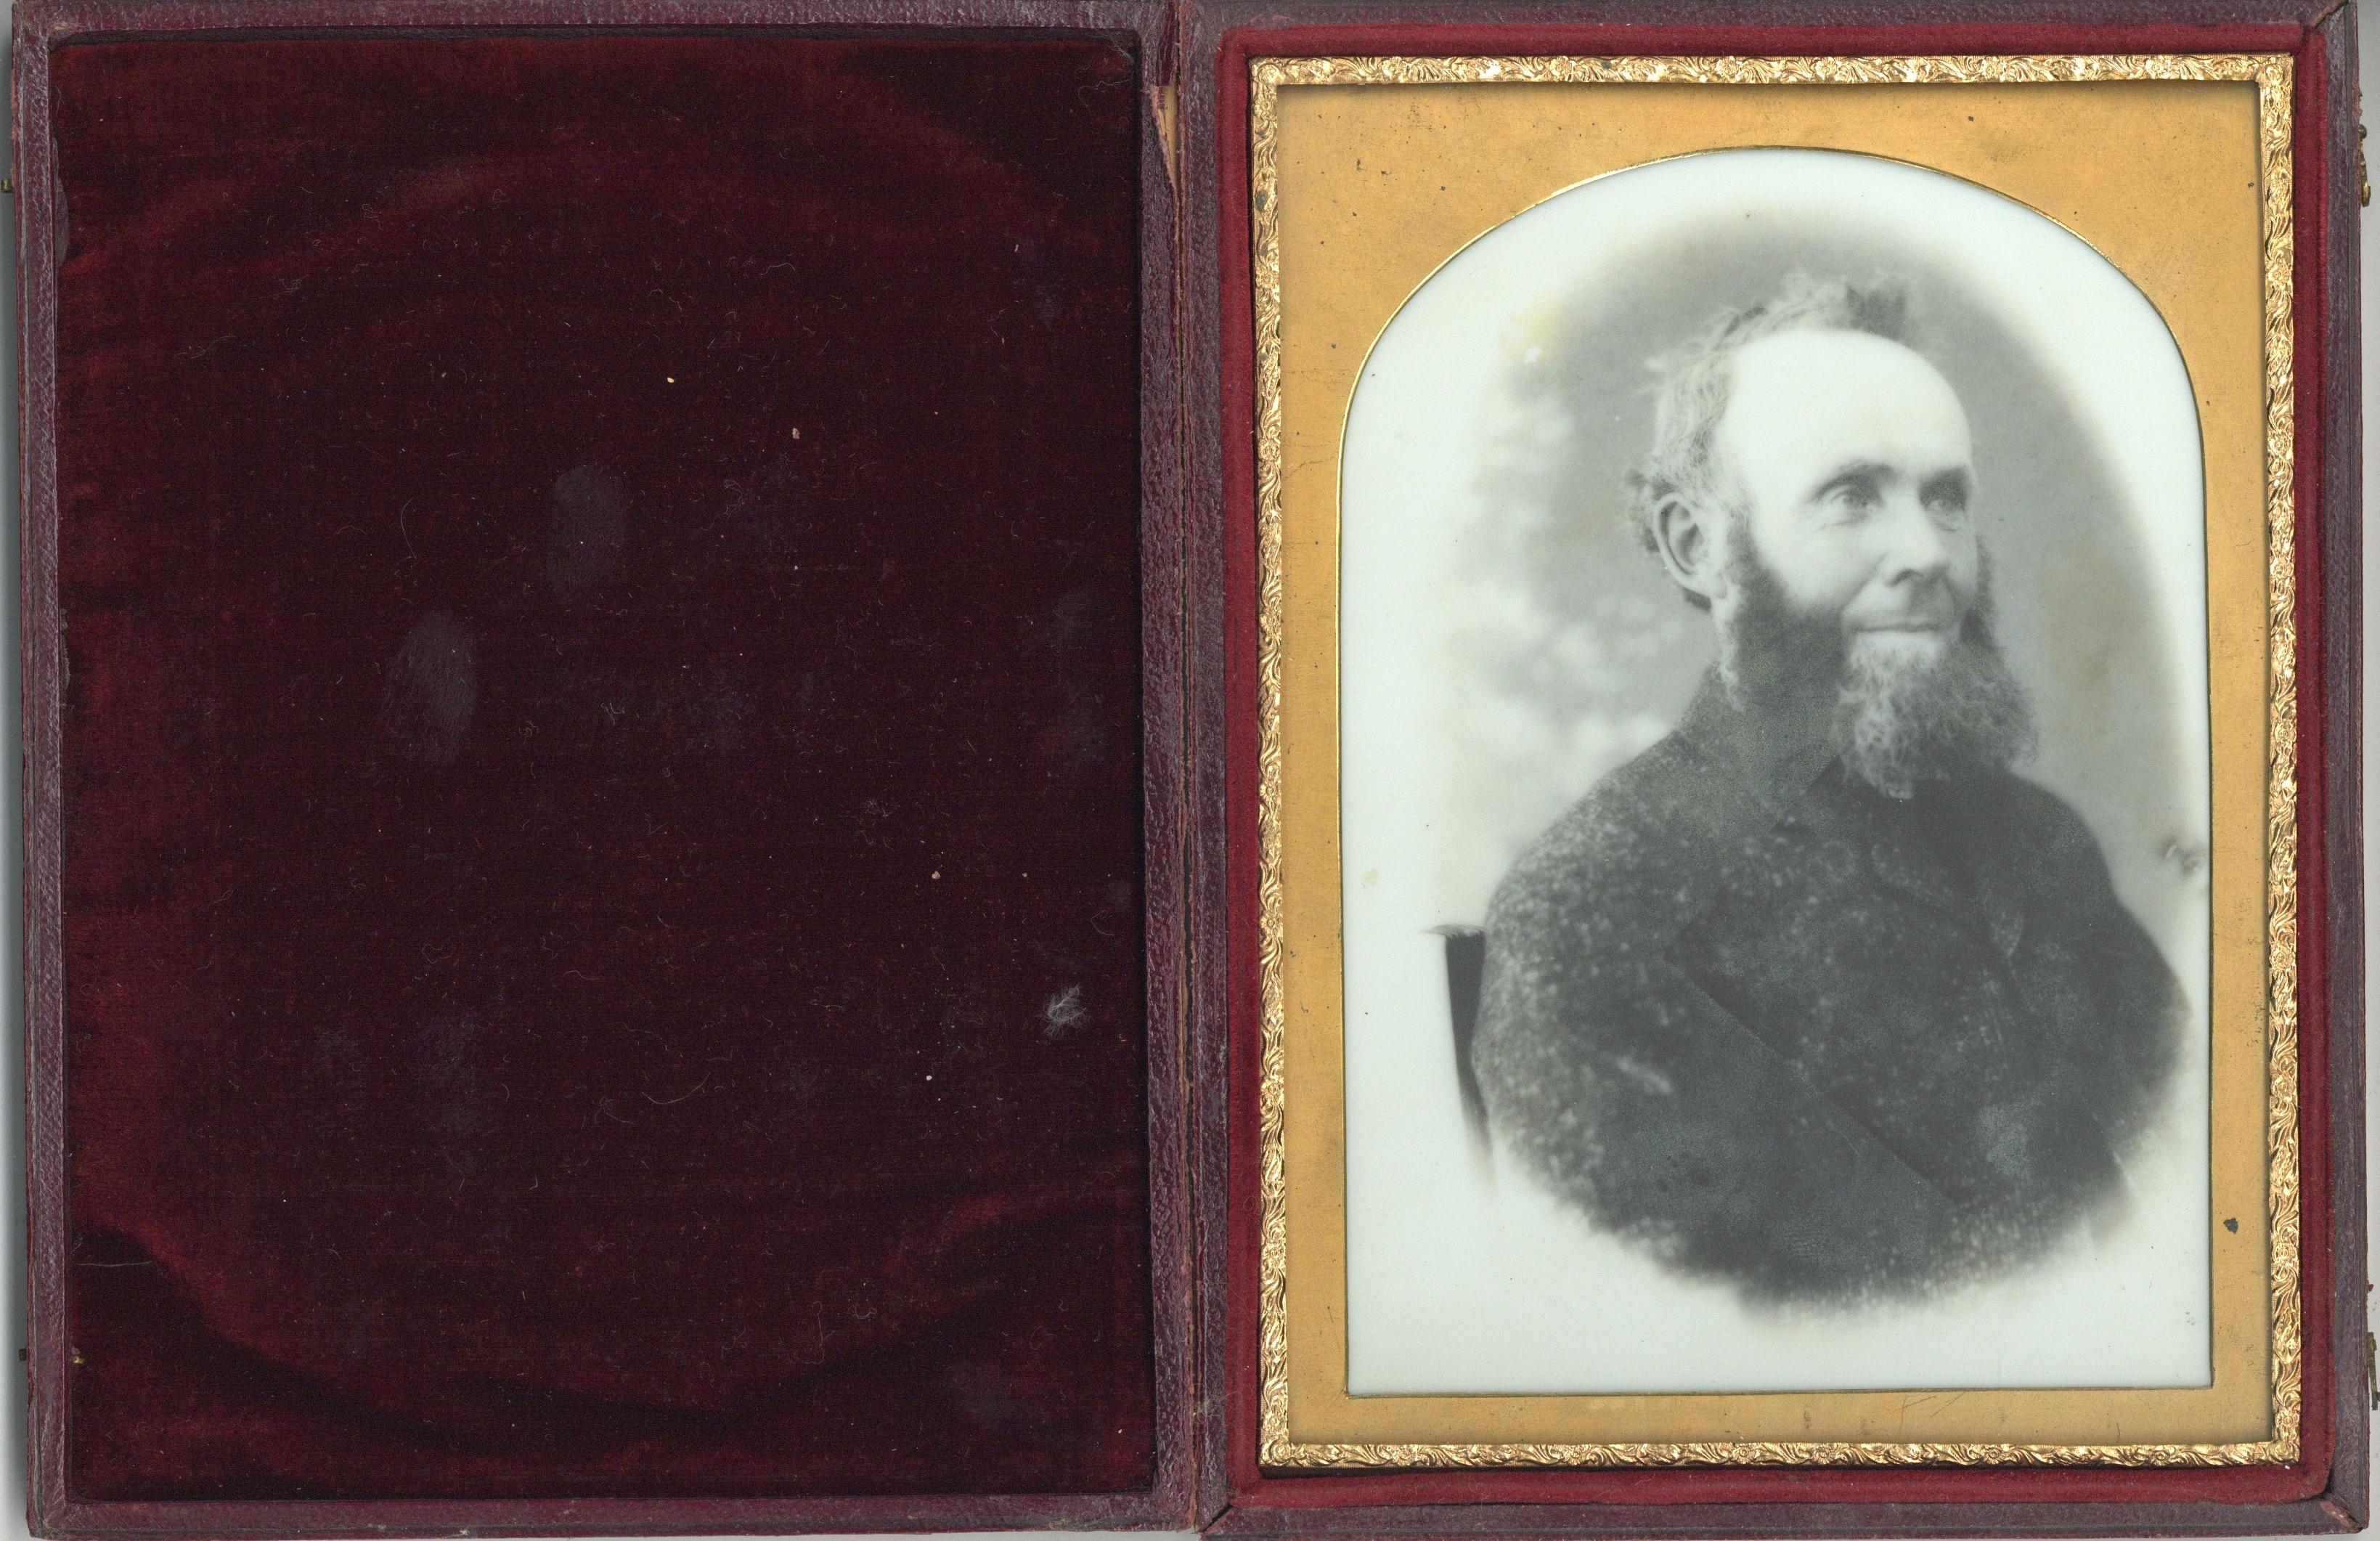 HIRAM CROMPTON BOOTH (1825-1890), An Opalotype Photograph, - Image 2 of 7